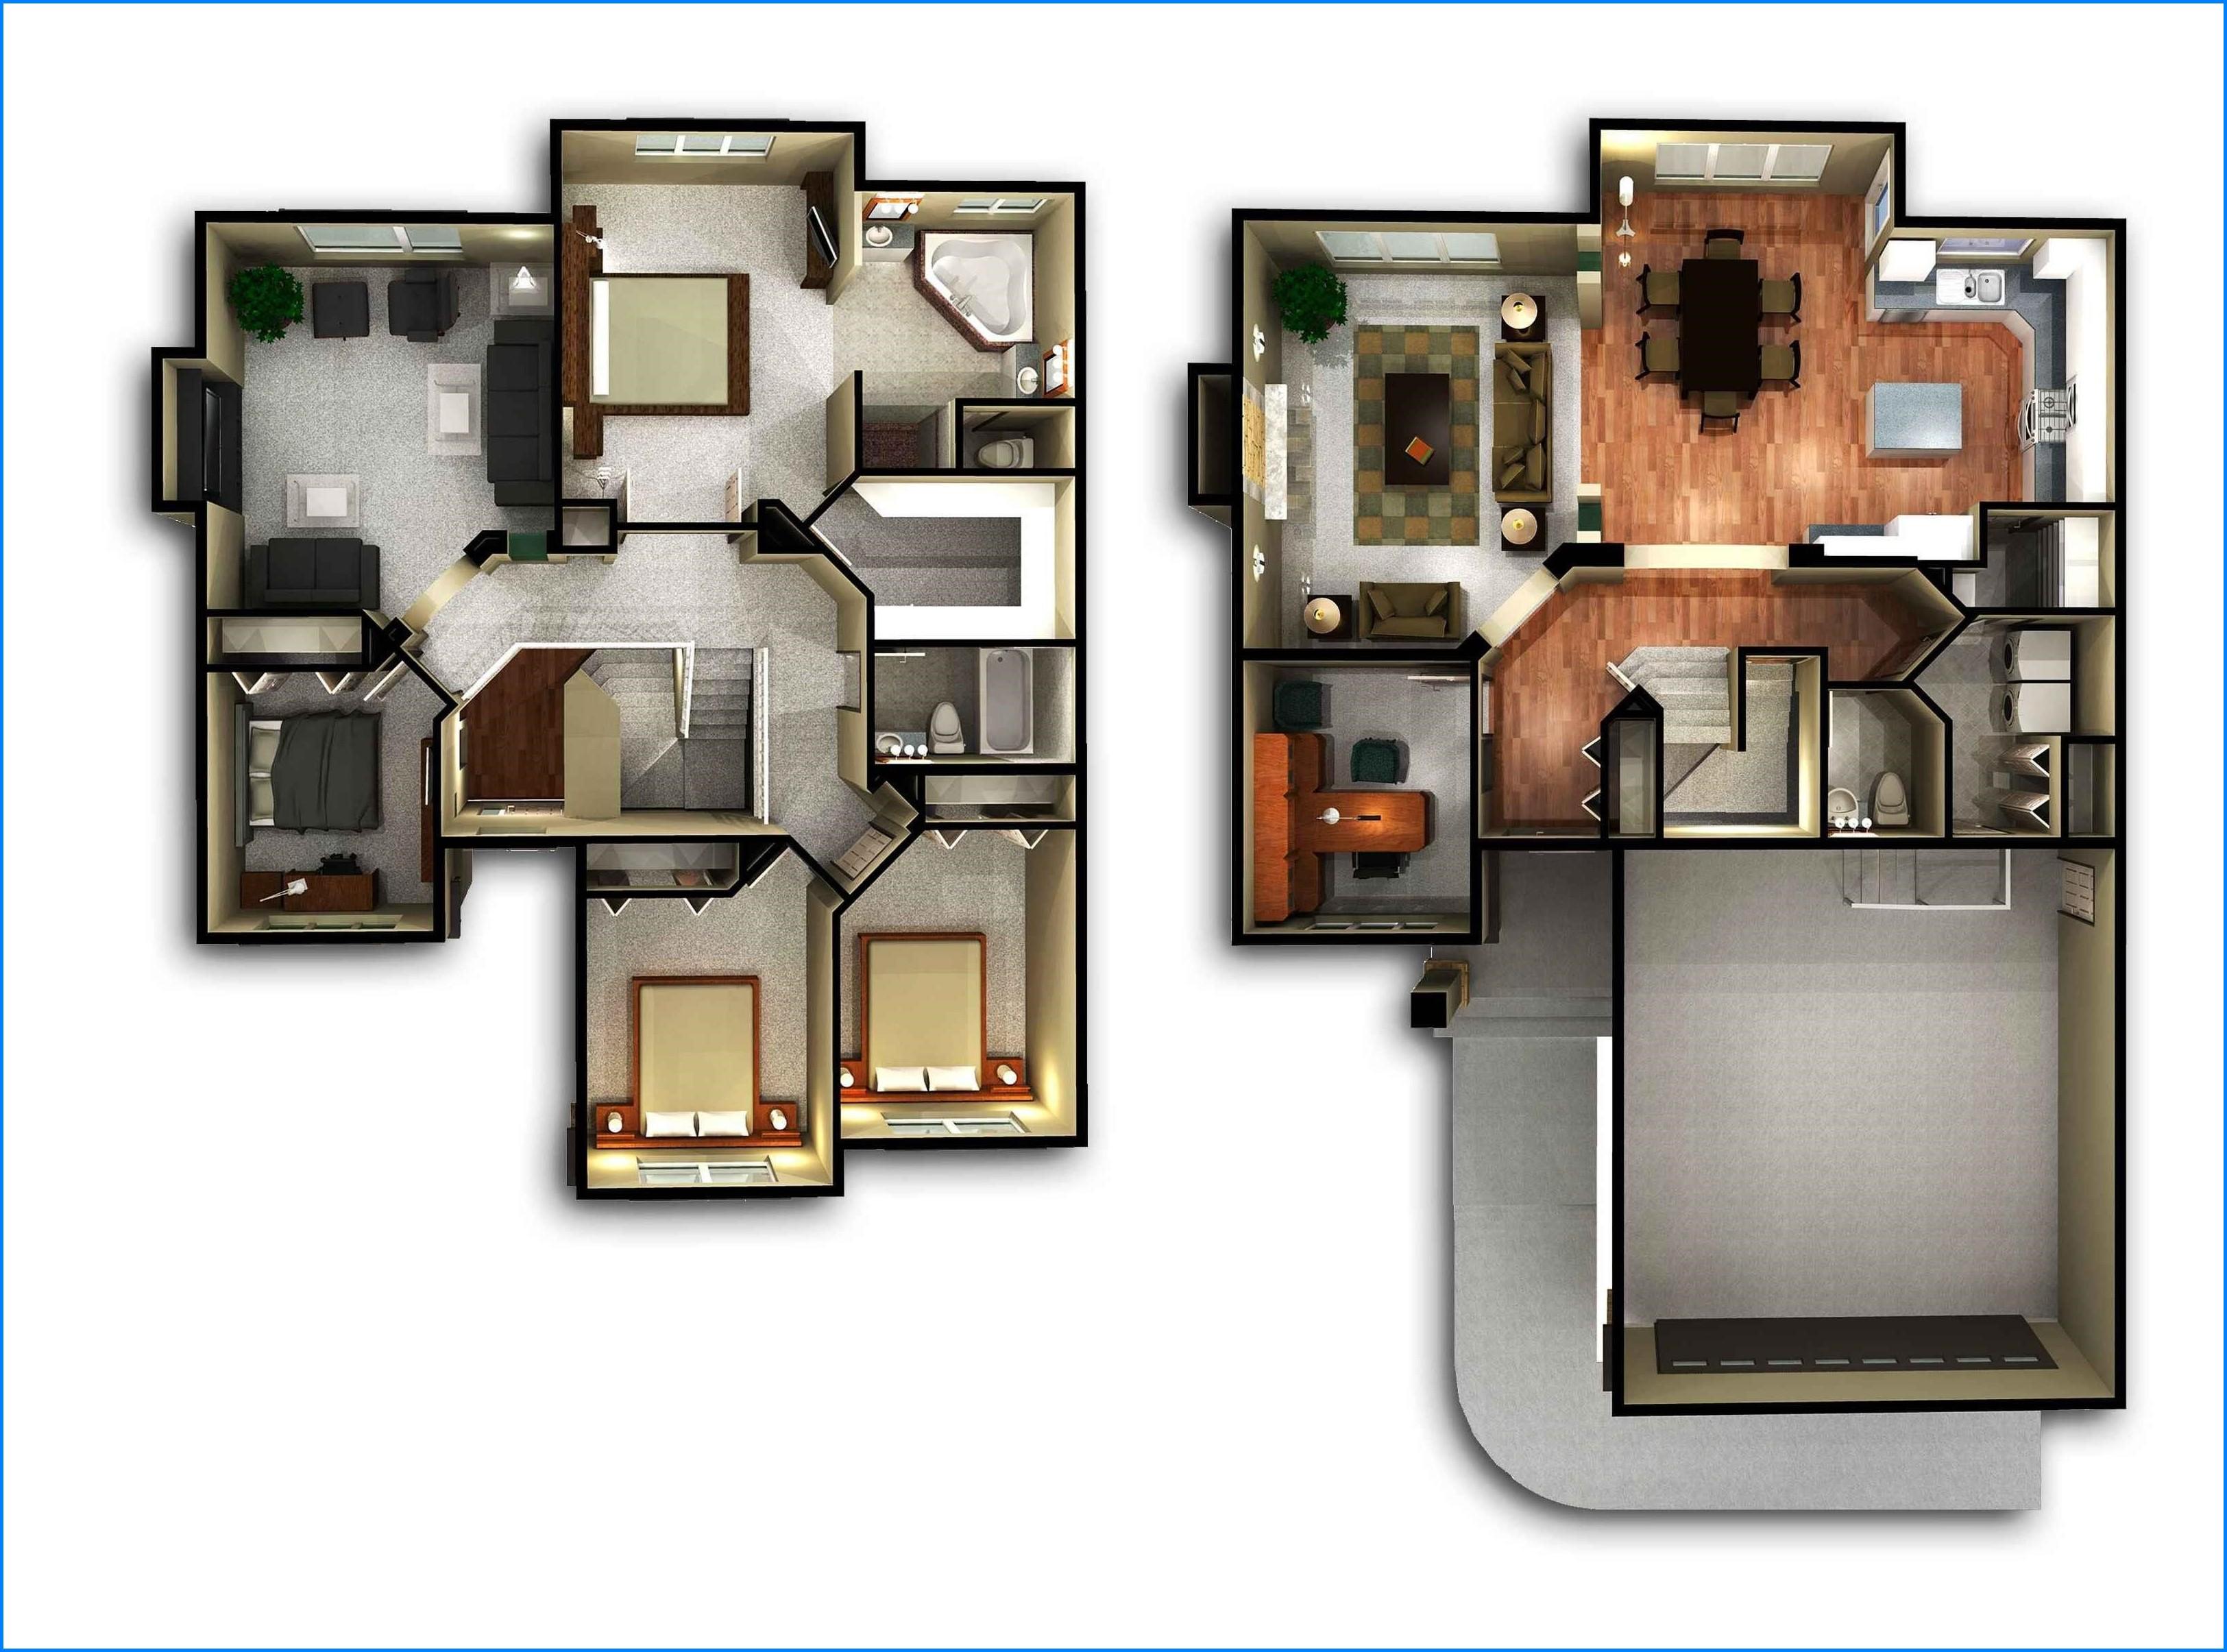 990 Koleksi Gambar Denah Rumah Minimalis Sederhana Modern 2 Lantai HD Terbaru